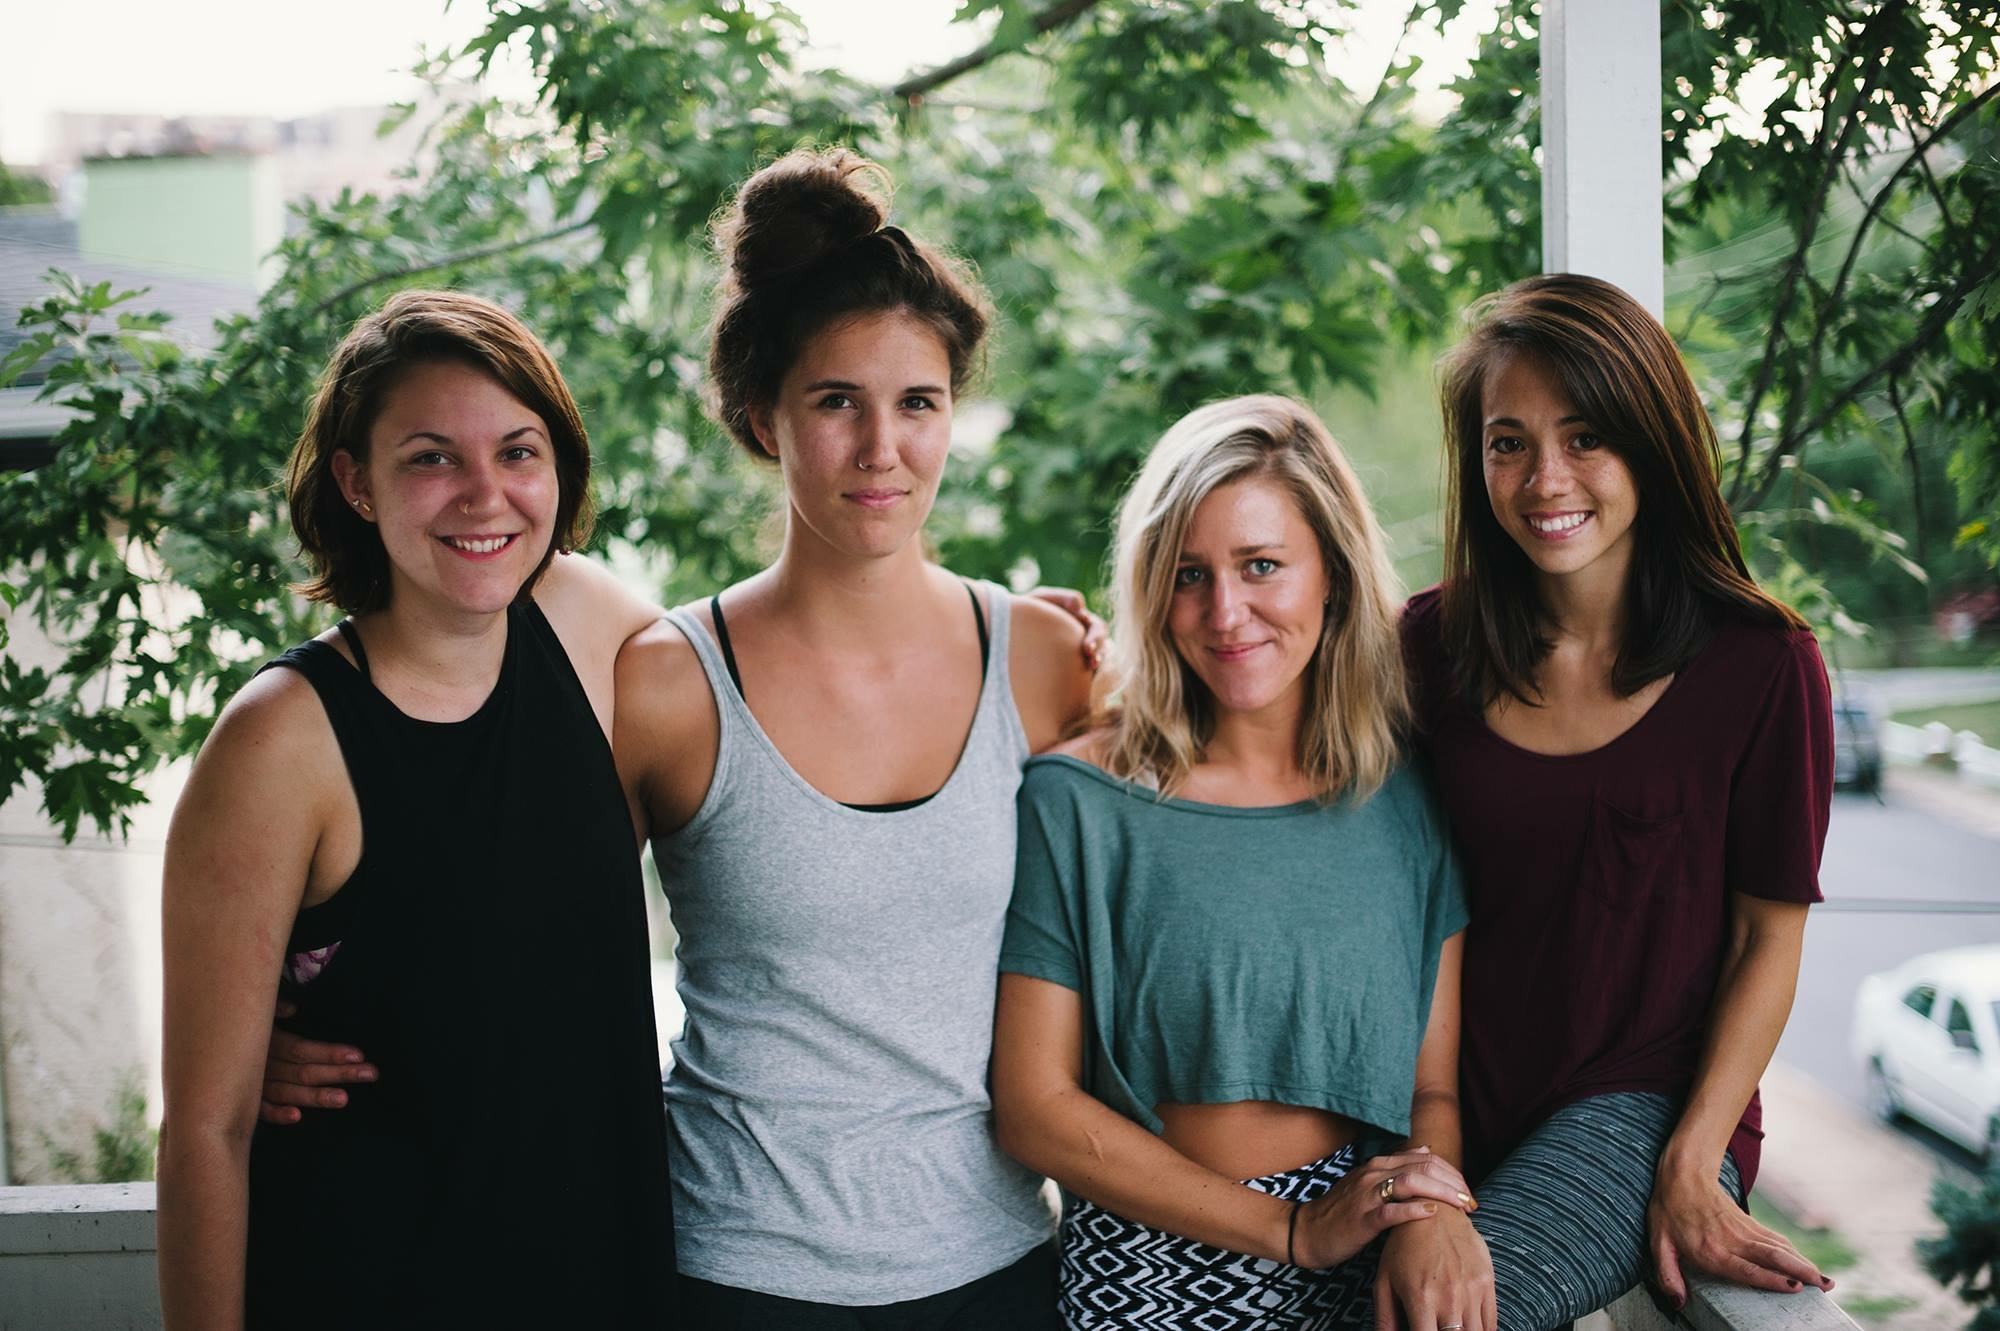 Dancers Sarah MIcoch, Lauren Stonestreet, Linnea White, and Becca Lee.